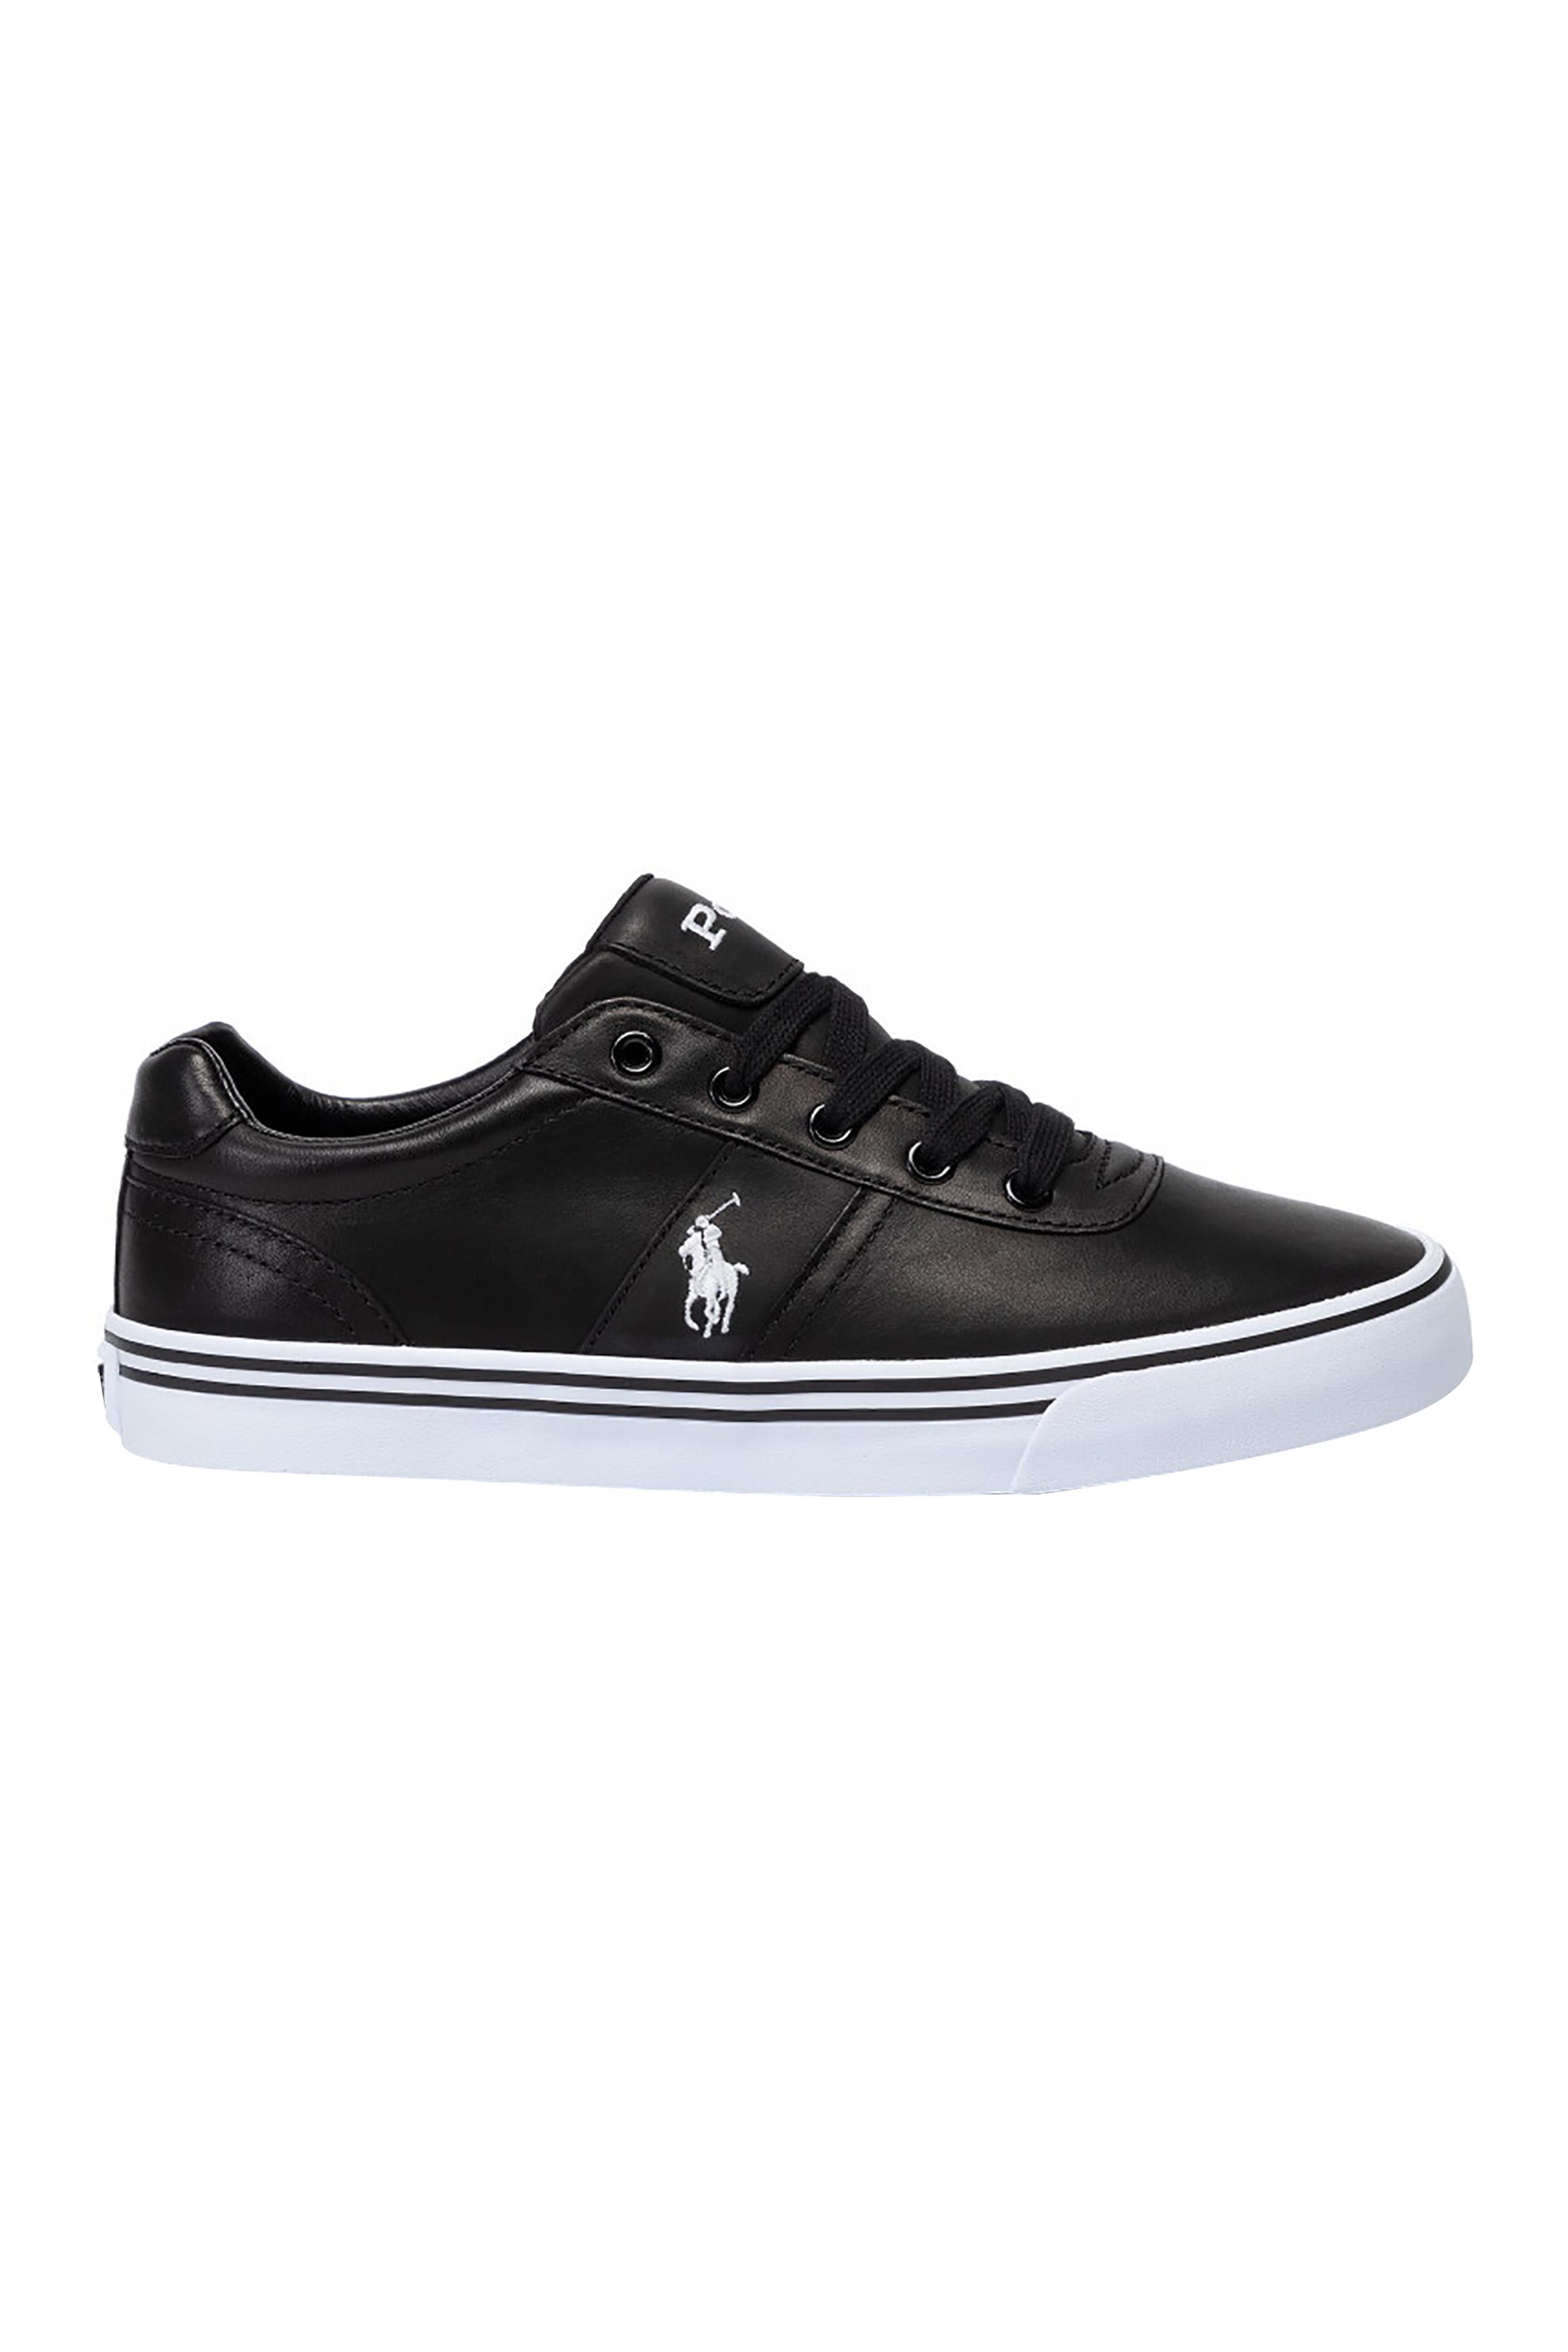 Polo Ralph Lauren ανδρικά δερμάτινα sneakers – 816765046003 – Μαύρο